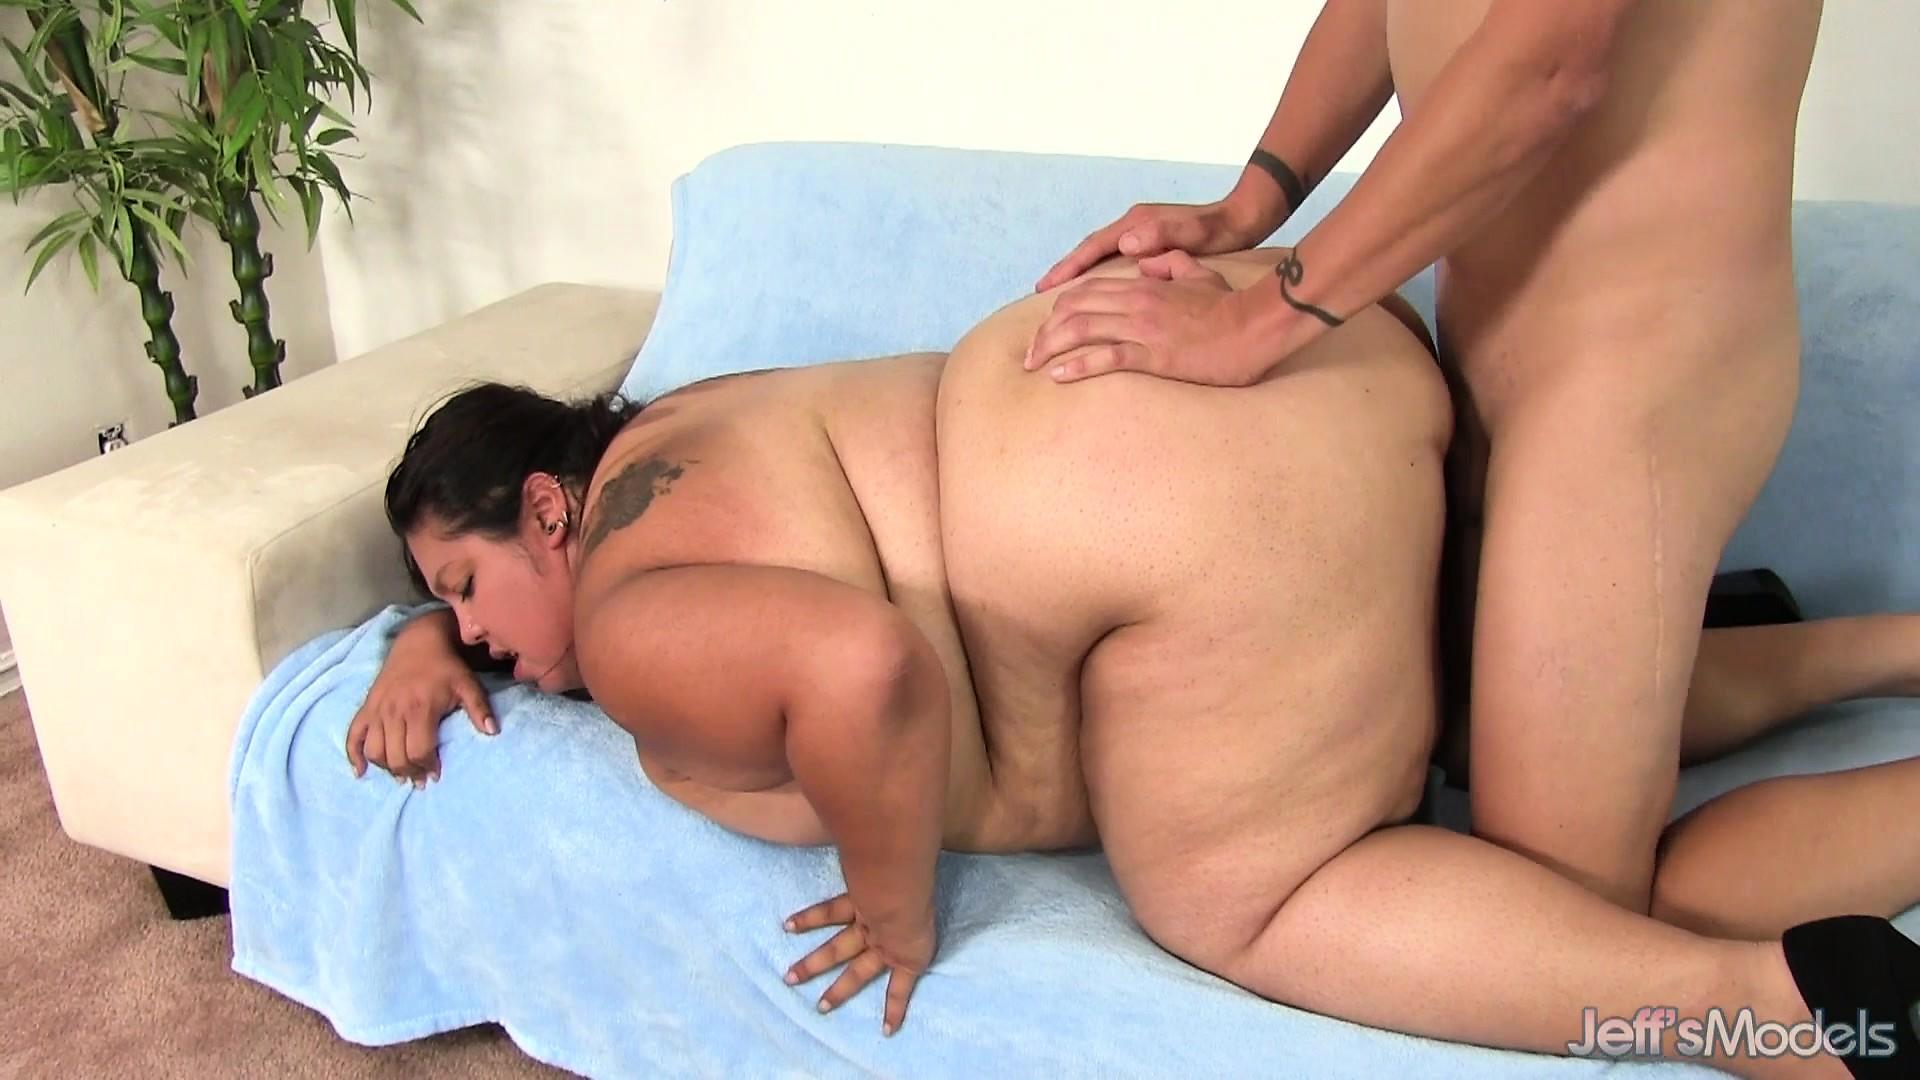 threesome porn downloads